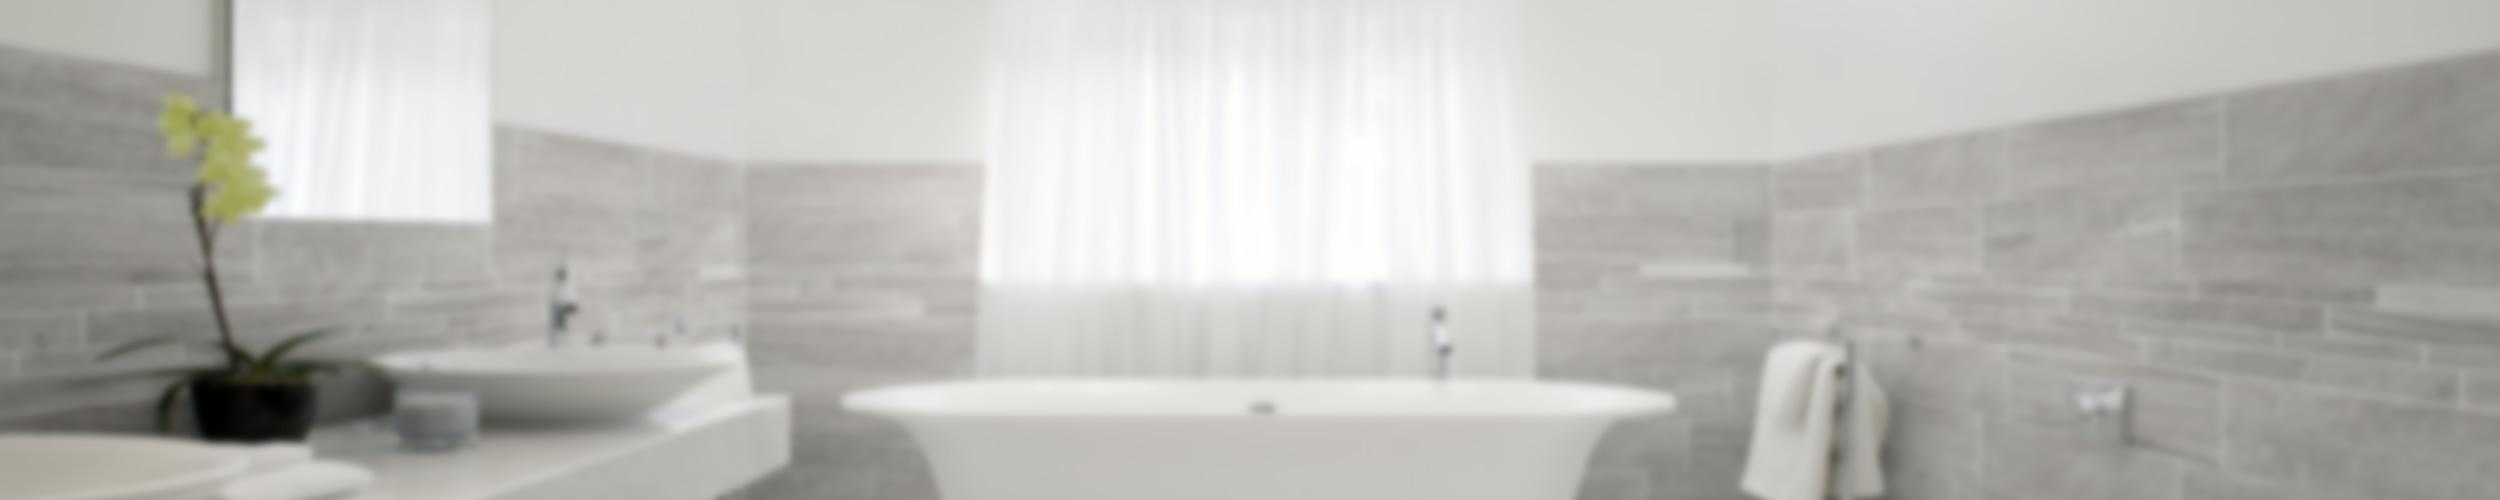 banyo-arka-plani44